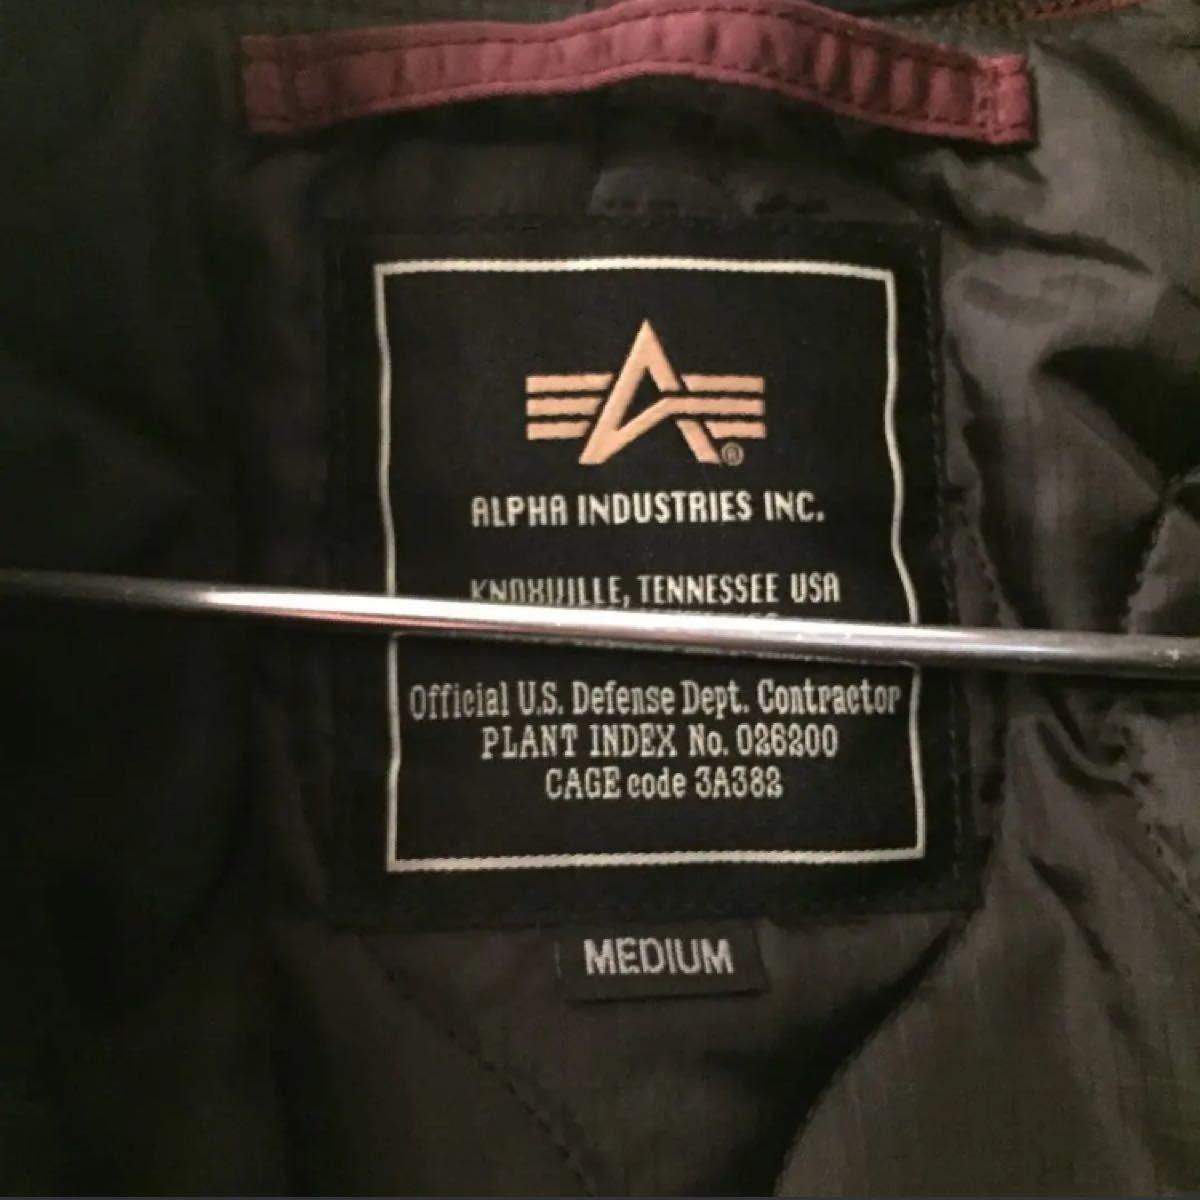 MA-1 alpha×アダムエロペ フライトジャケット ブルゾン アルファ